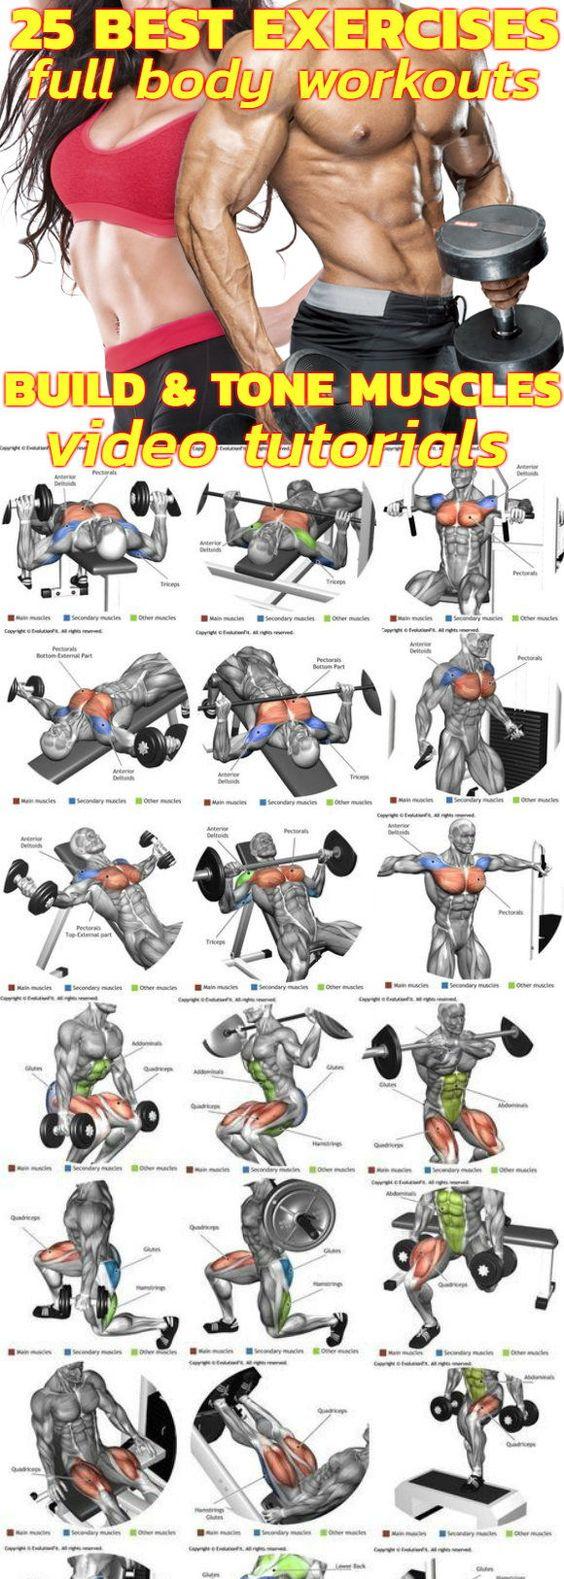 25 Best Exercises Full Body Workout